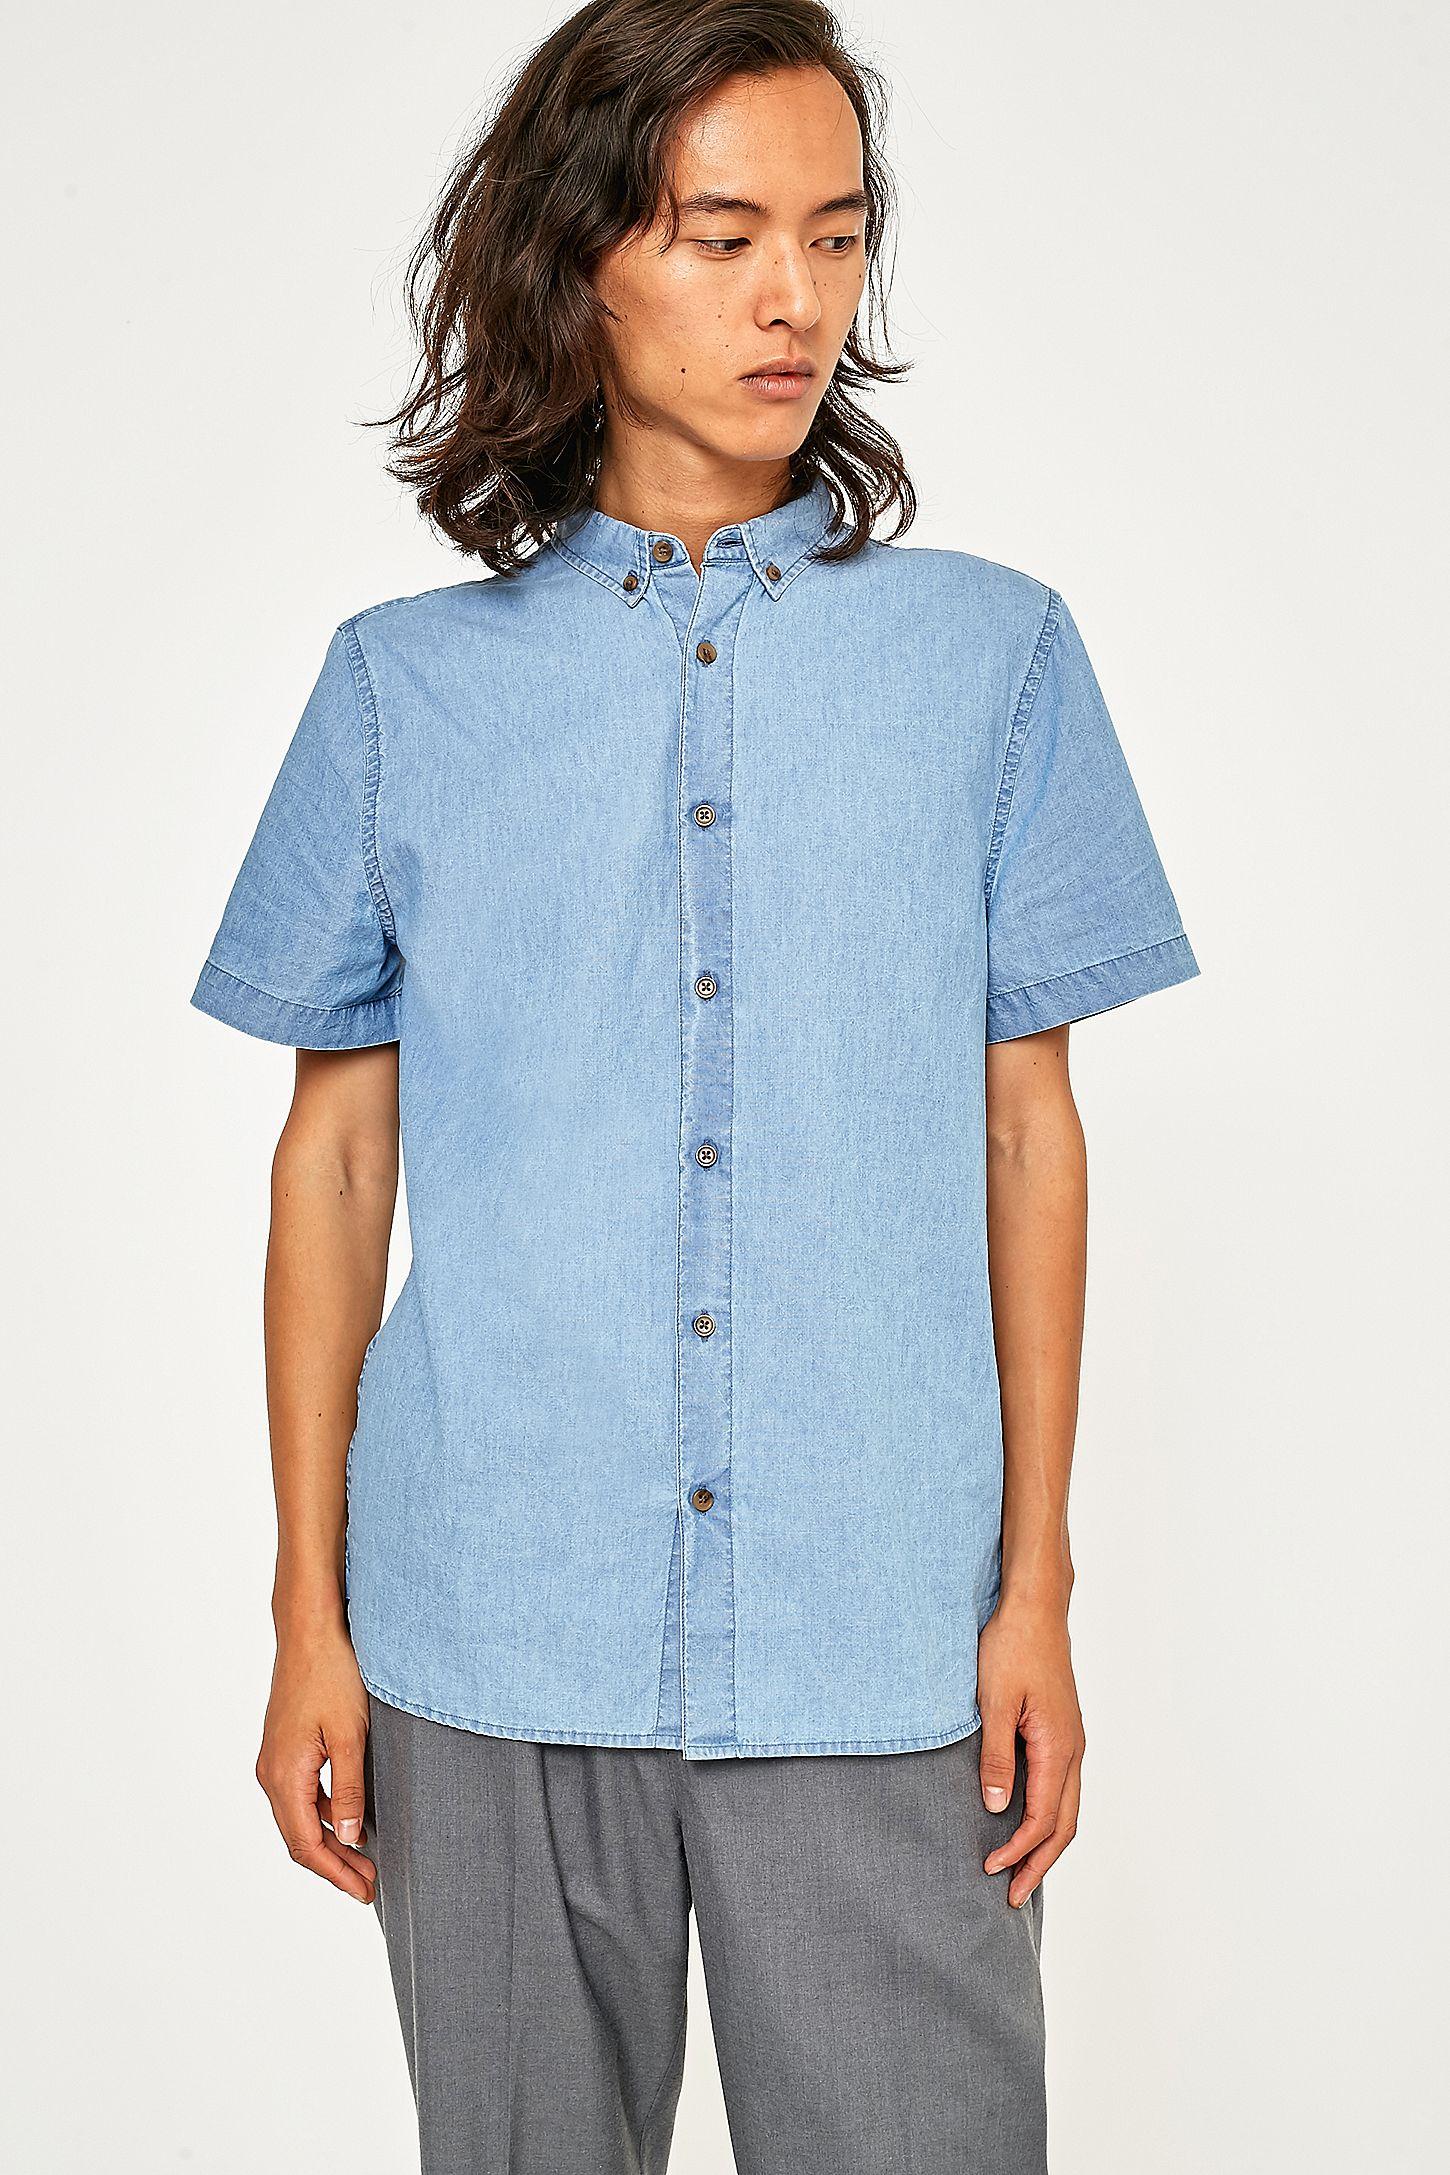 4dc795e9859 Urban Outfitters Denim Shirt Dress – DACC